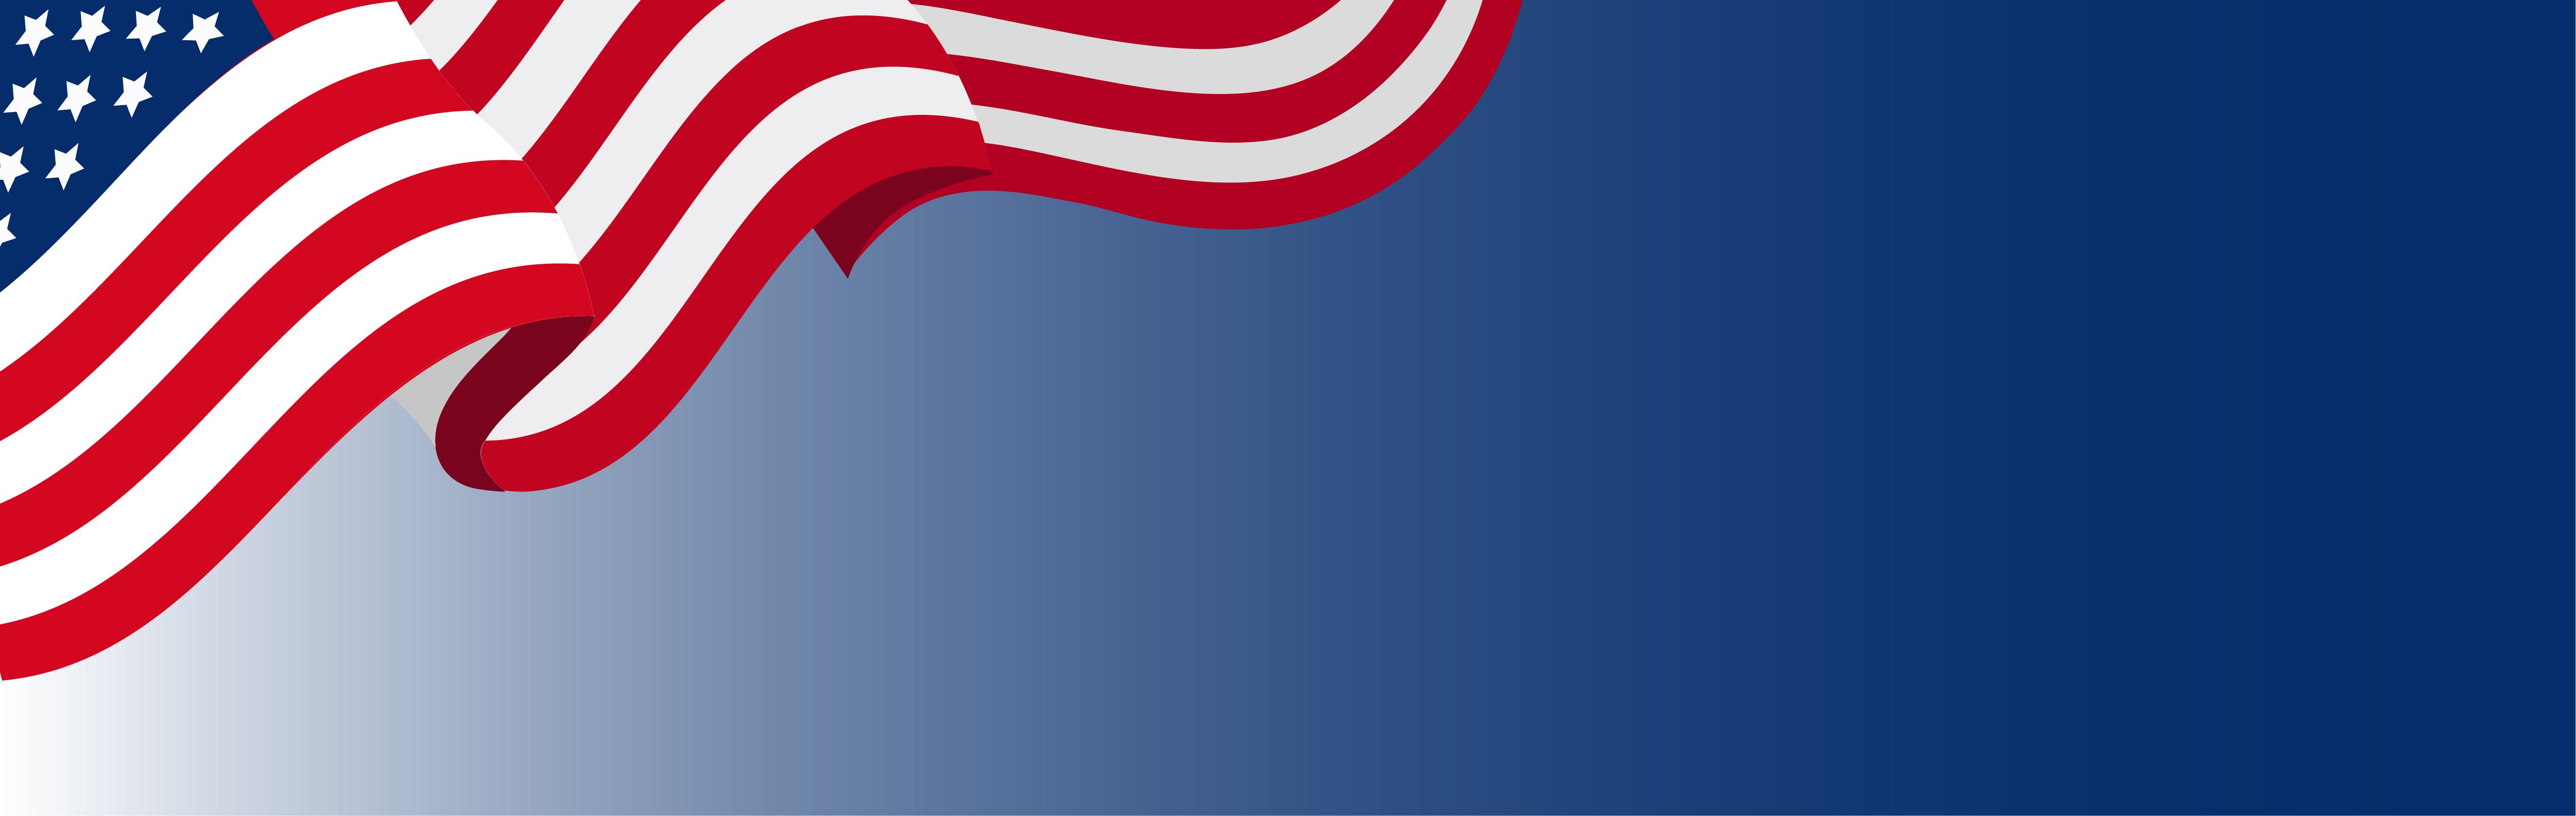 Garreco Dental USA Made Products